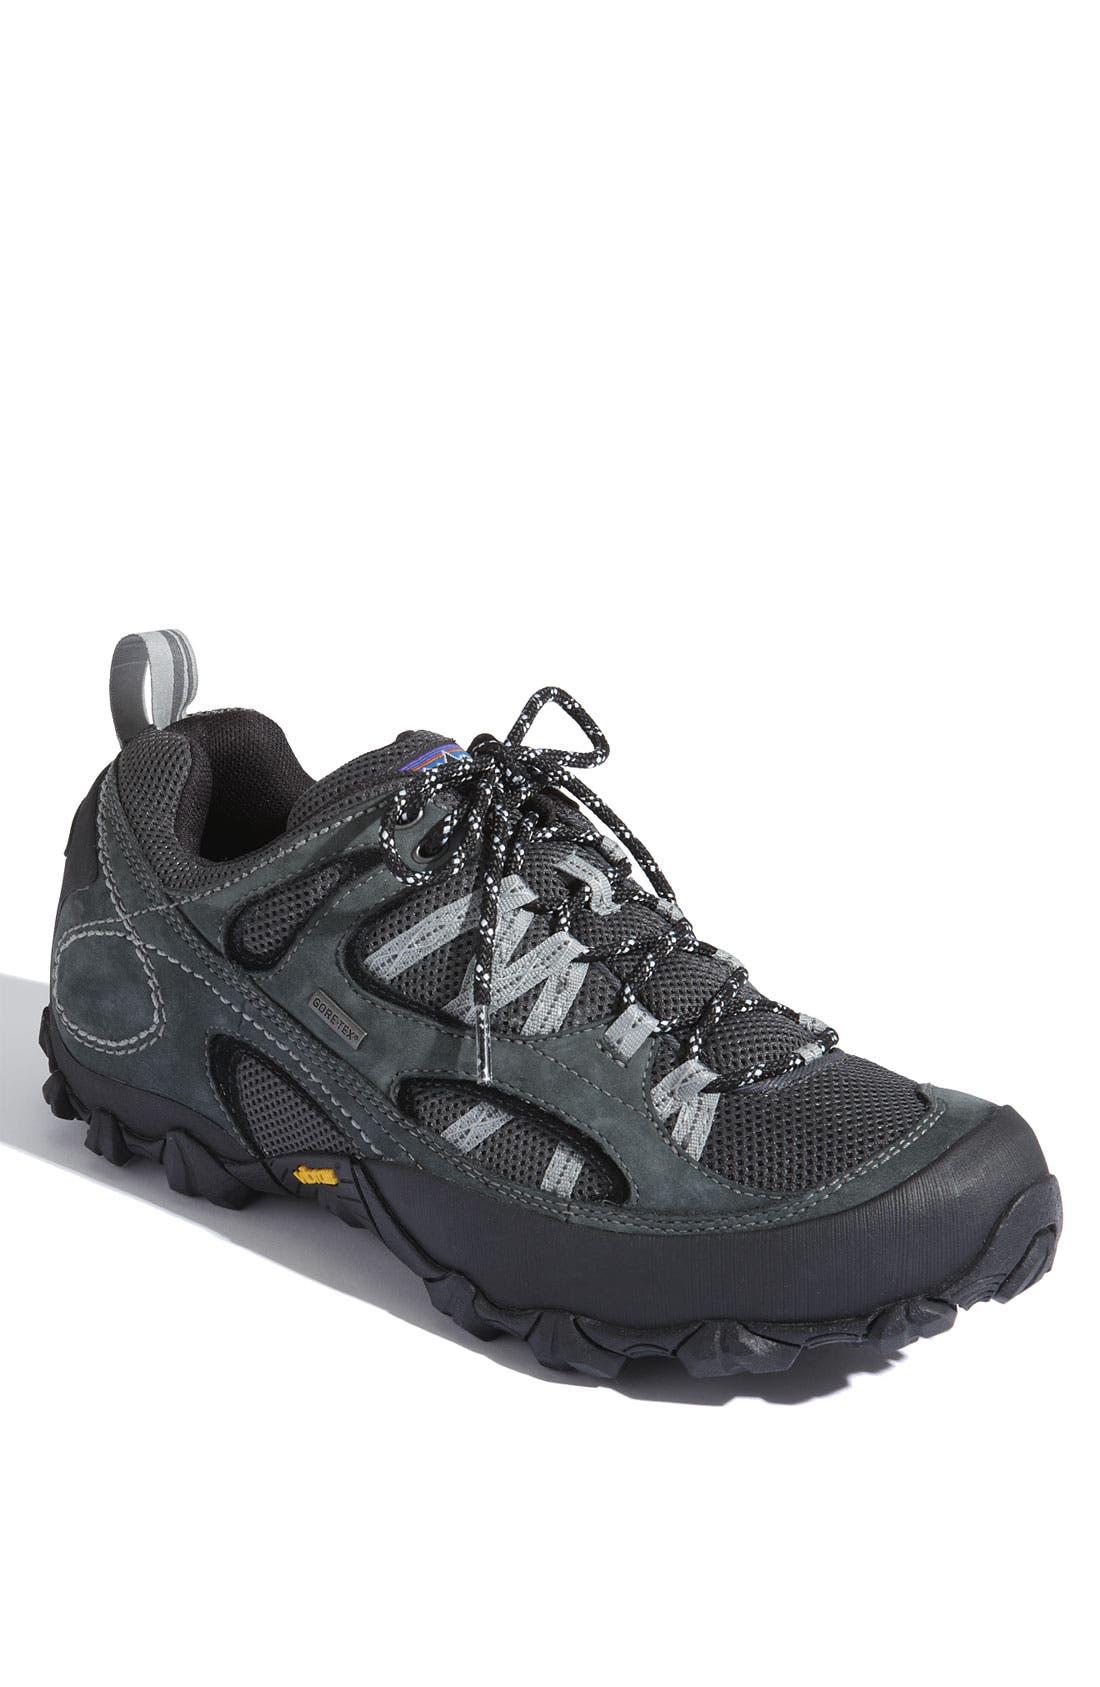 Main Image - Patagonia 'Drifter AC GTX' Trail Shoe